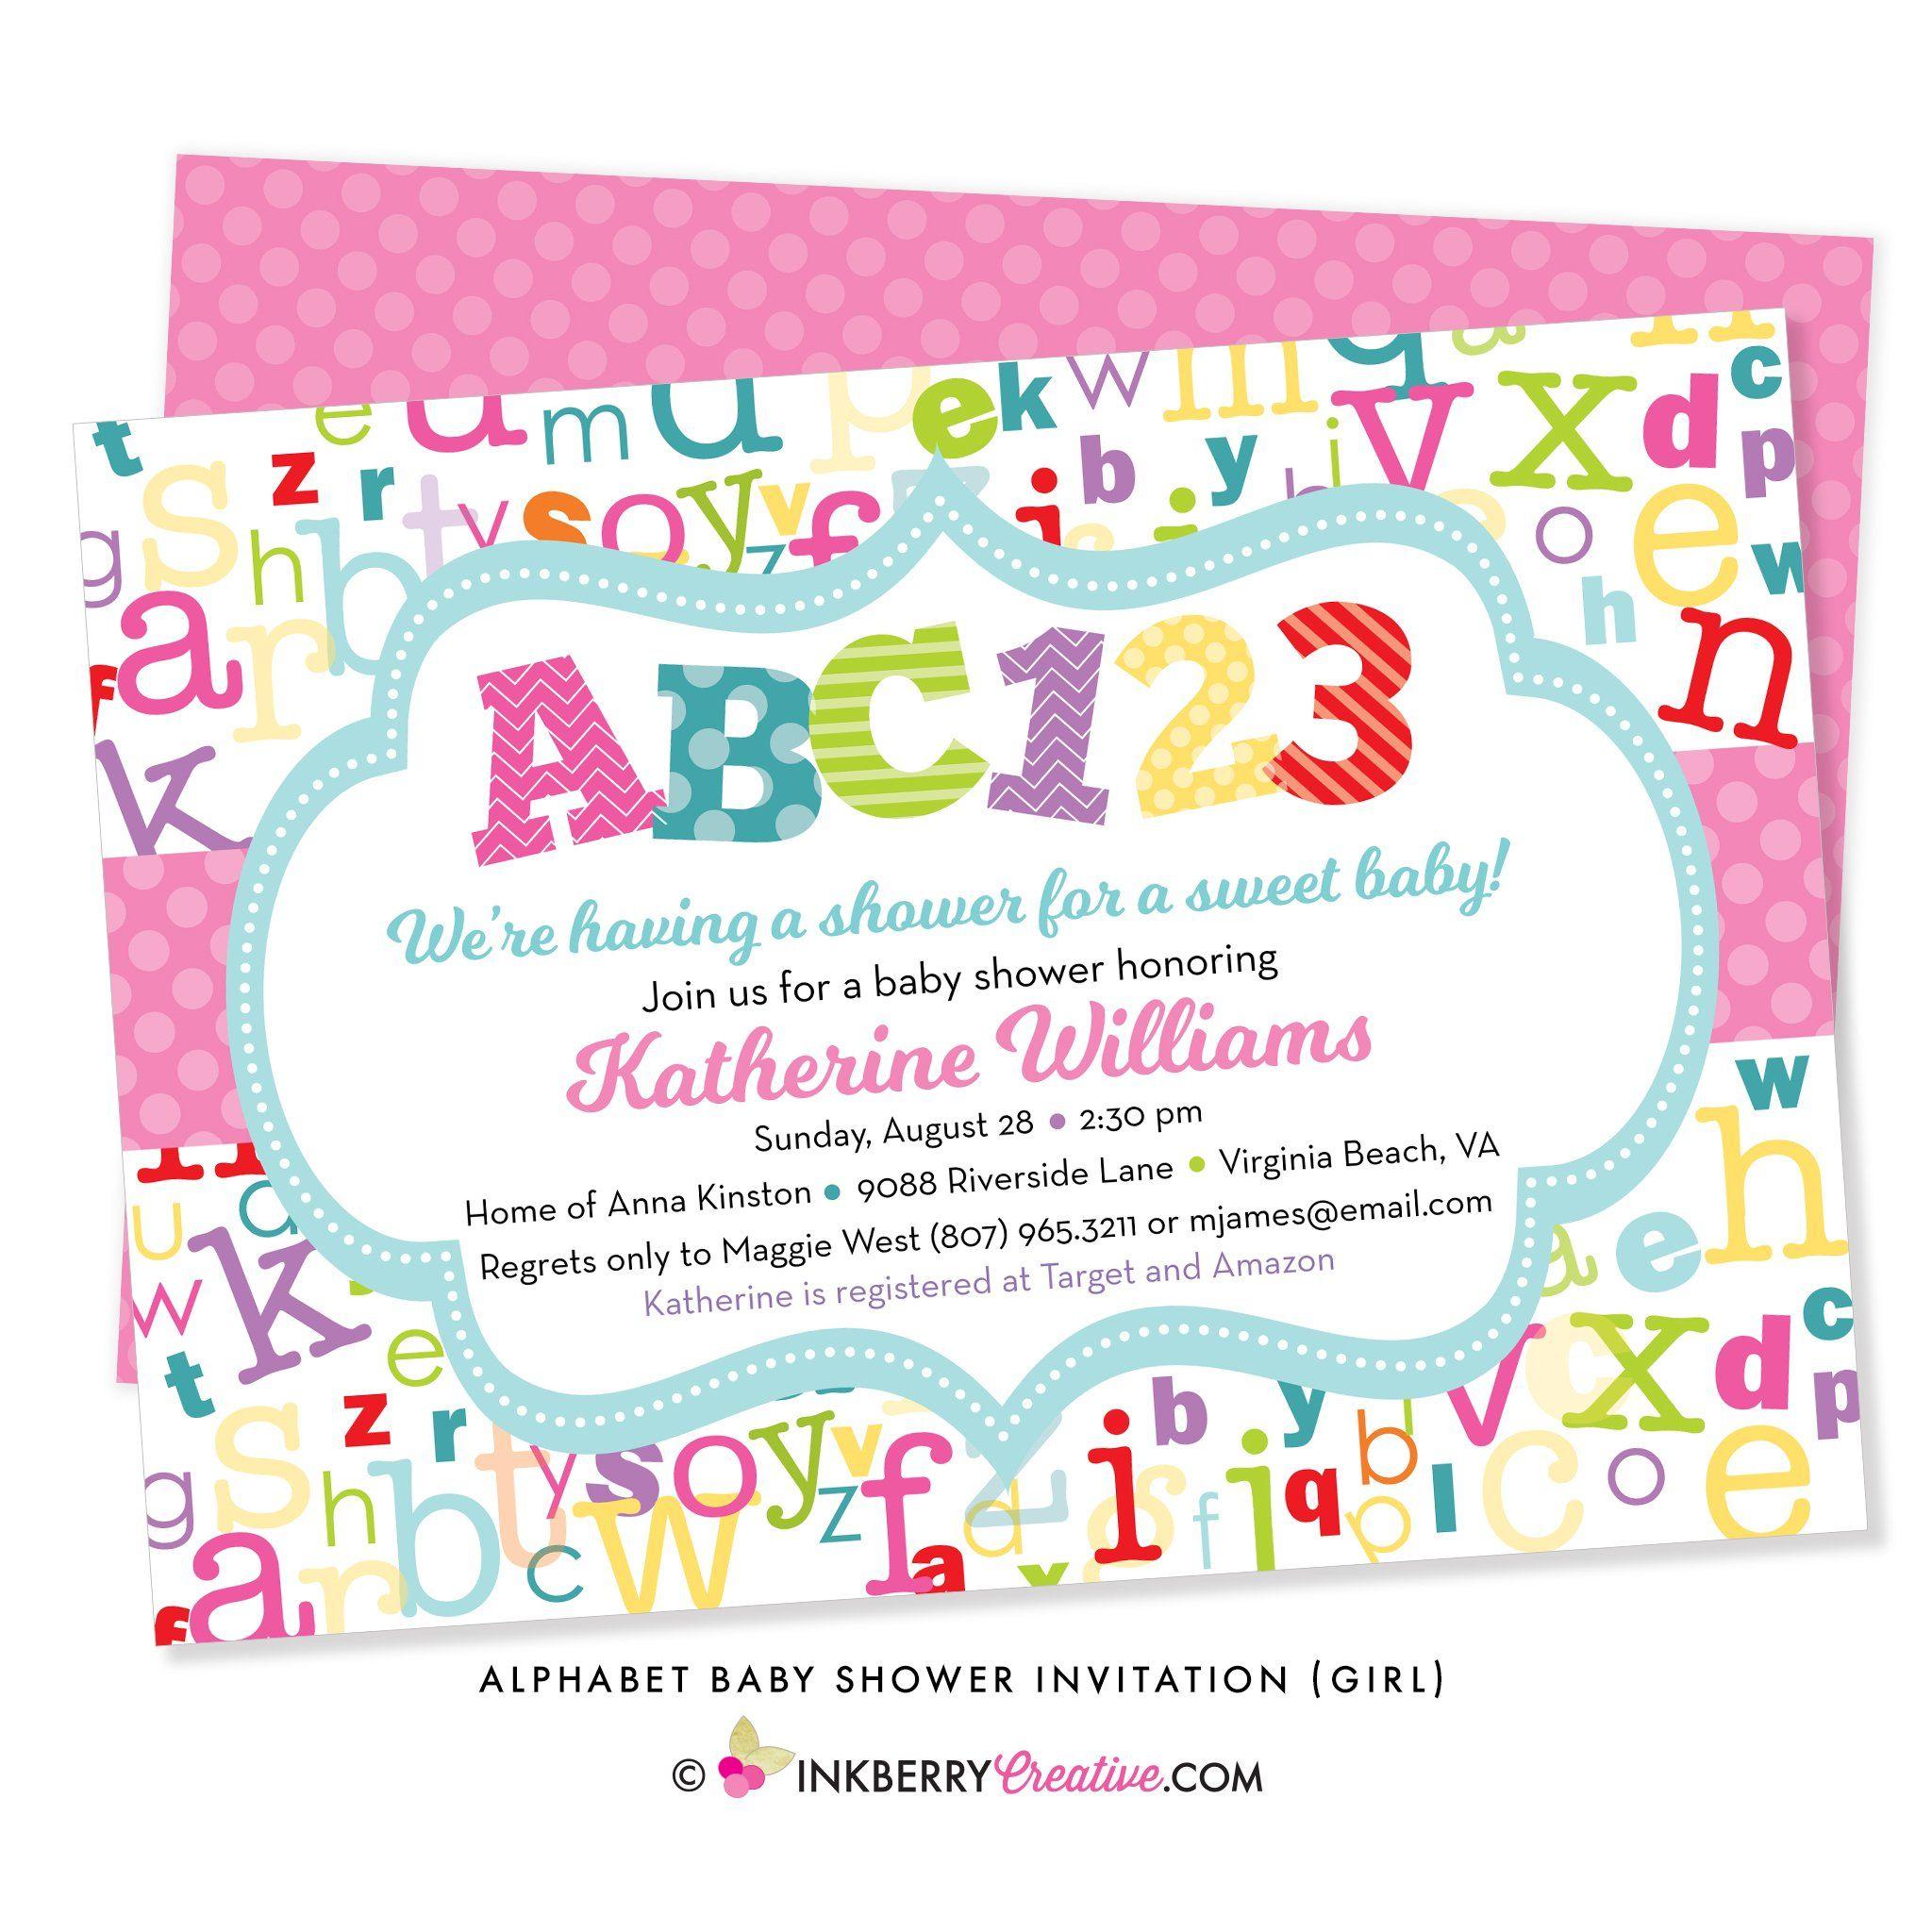 Alphabet Abc Baby Shower Invitation Girl